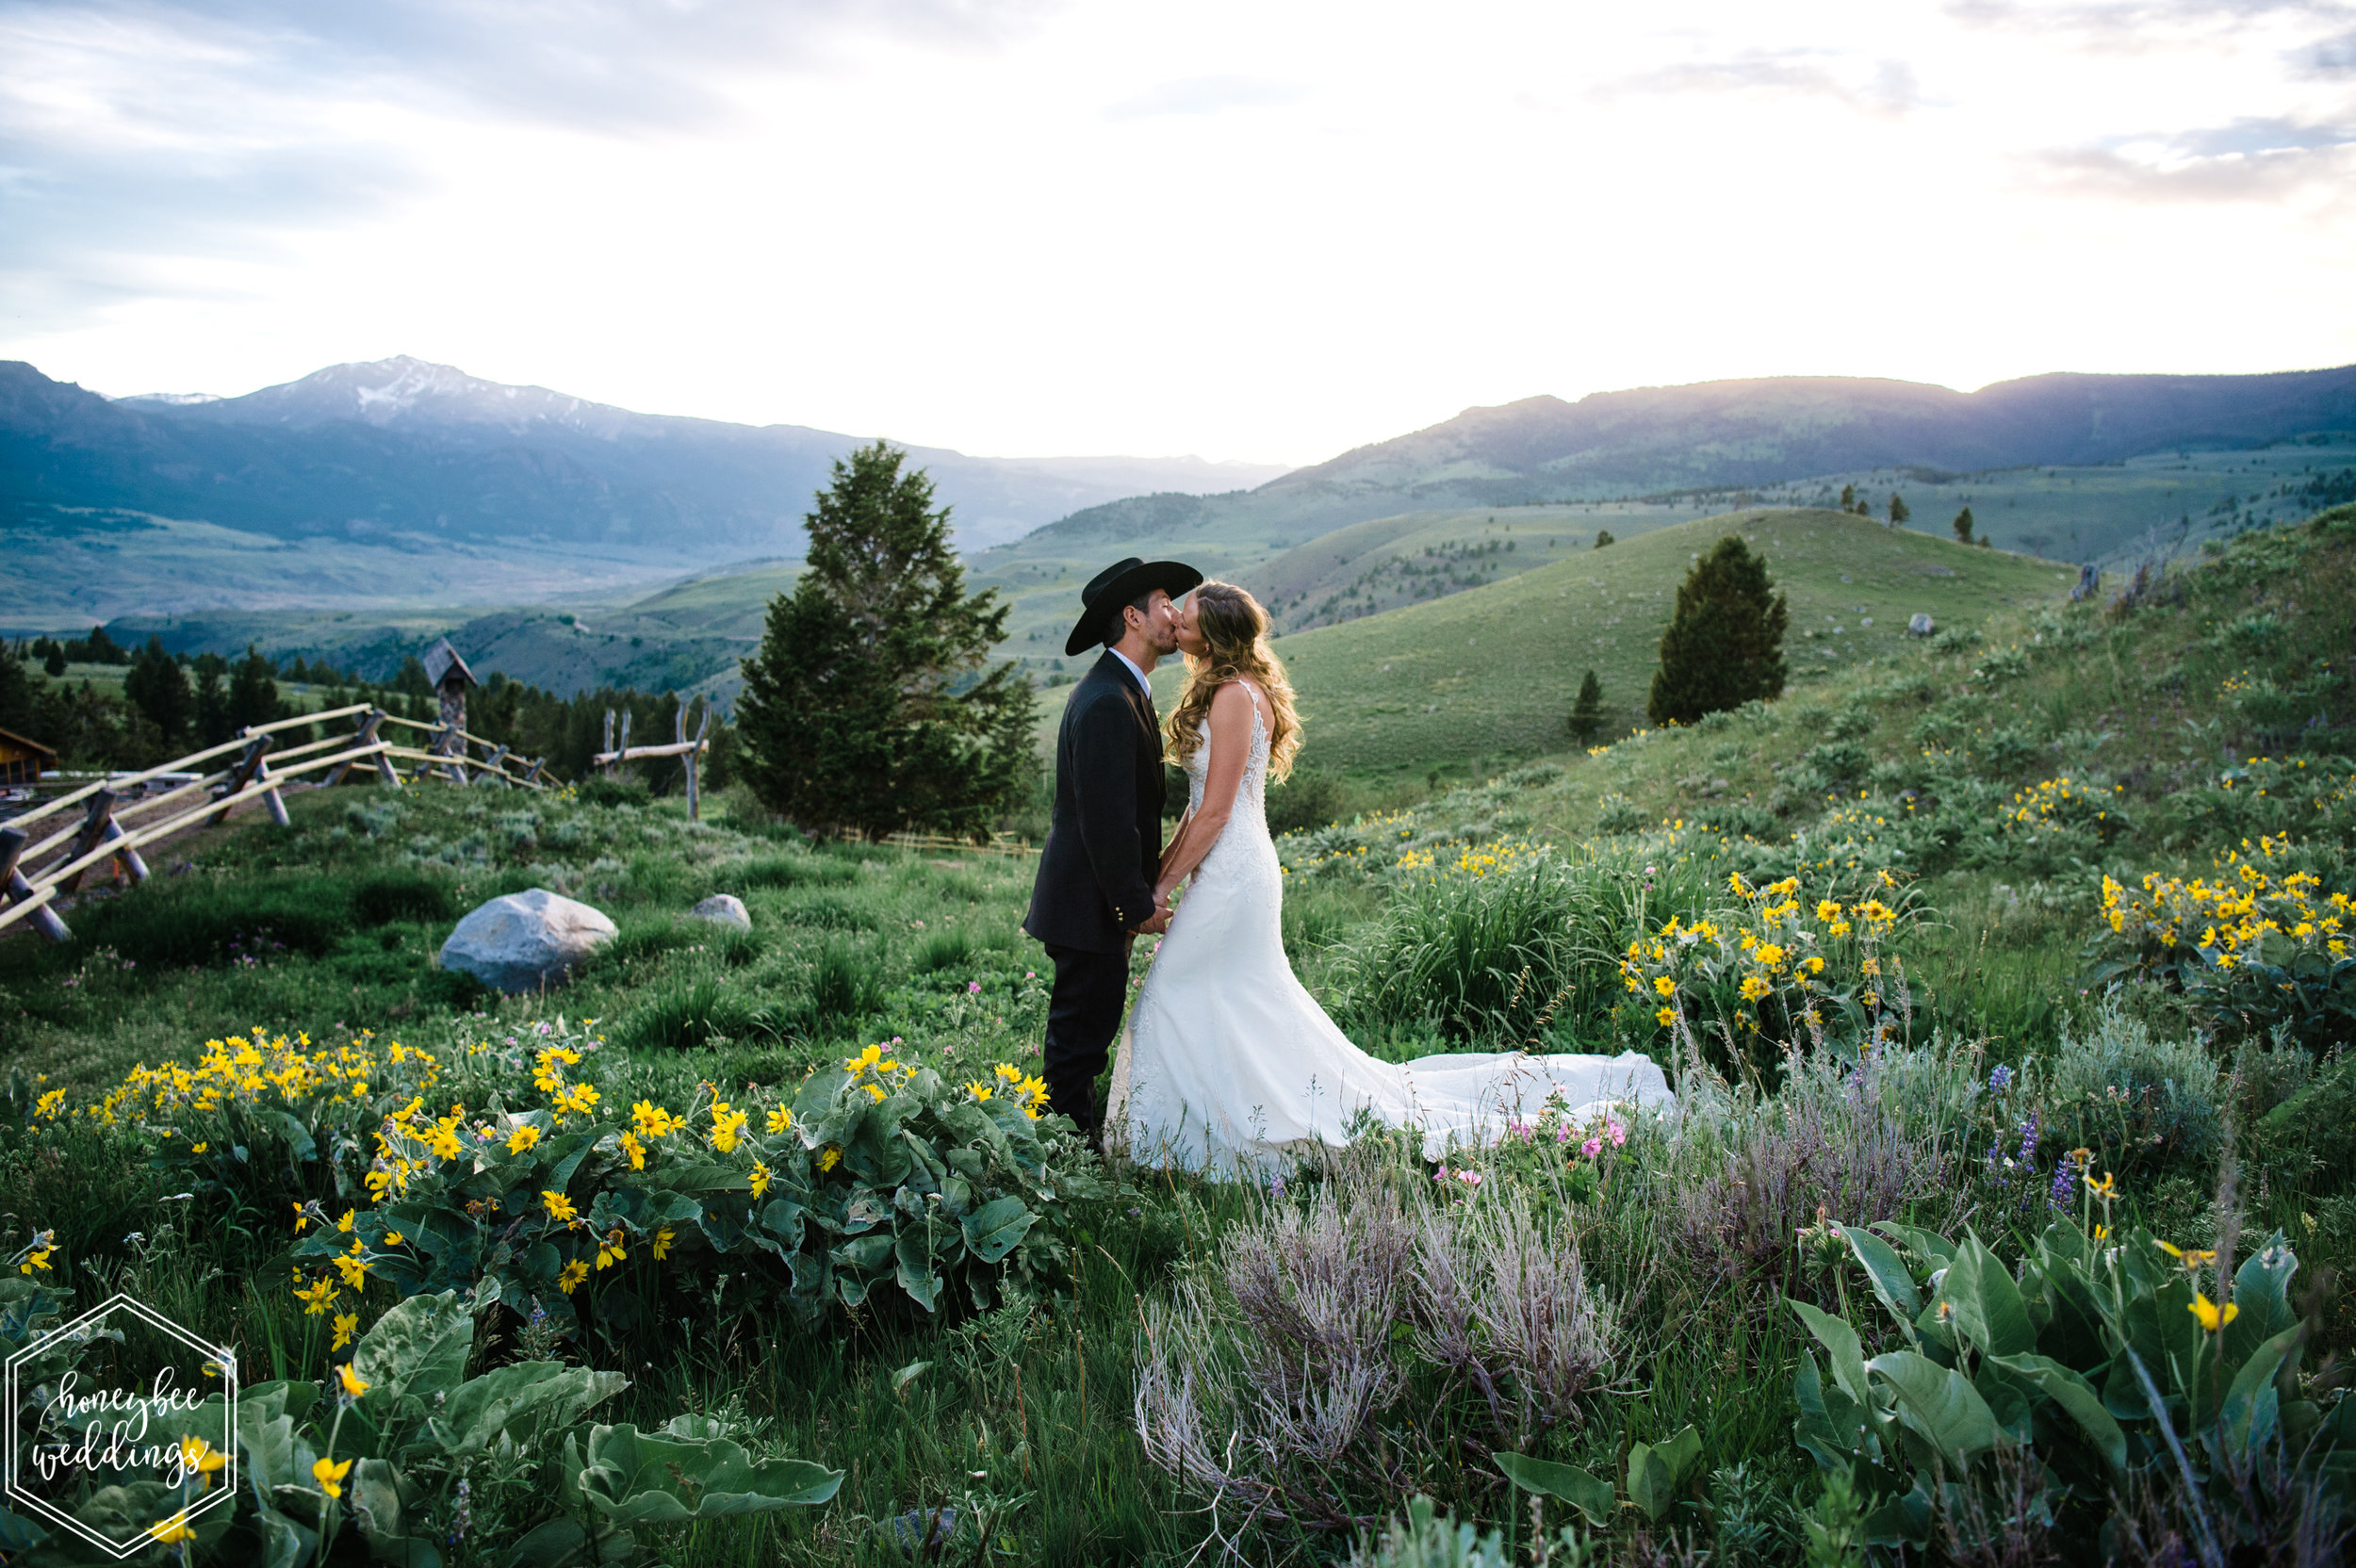 194Yellowstone National Park Wedding_Montana Wedding Photographer_Honeybee Weddings_Shannon & Jonathan_June 29, 2019-983.jpg